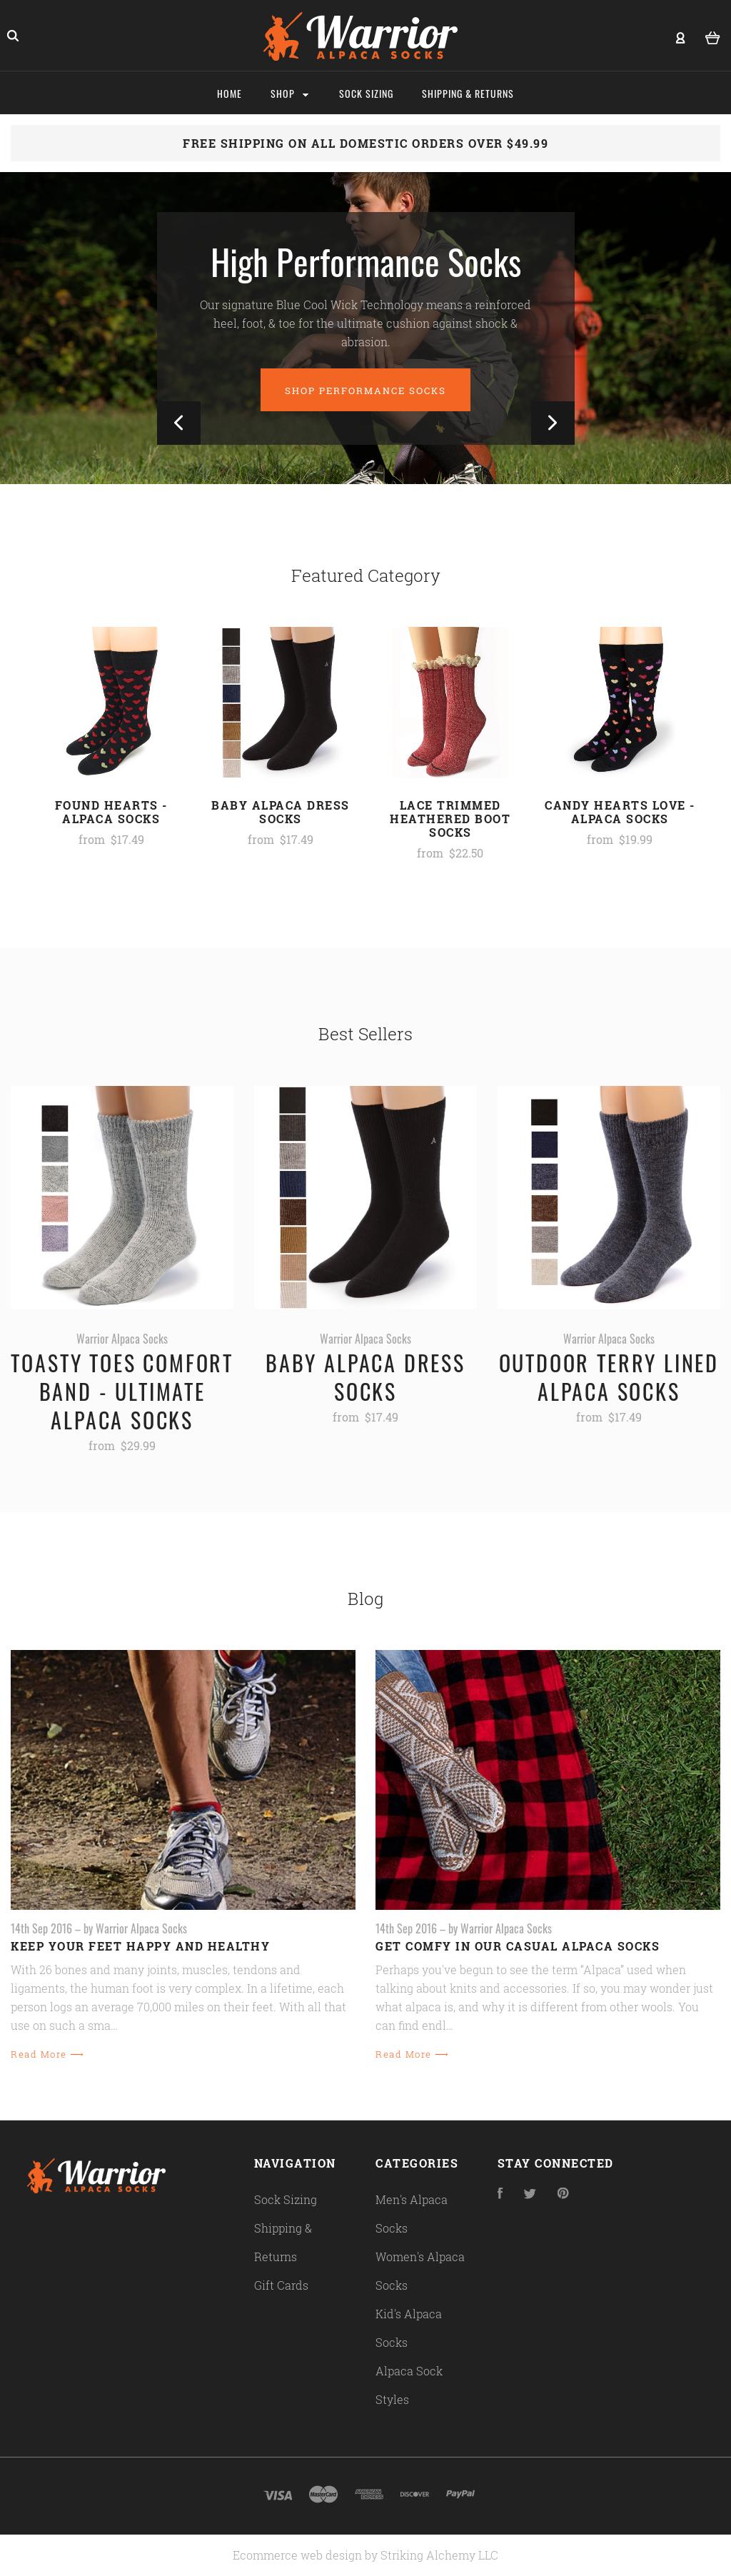 23070034935d Warrior Alpaca Socks Competitors, Revenue and Employees - Owler Company  Profile